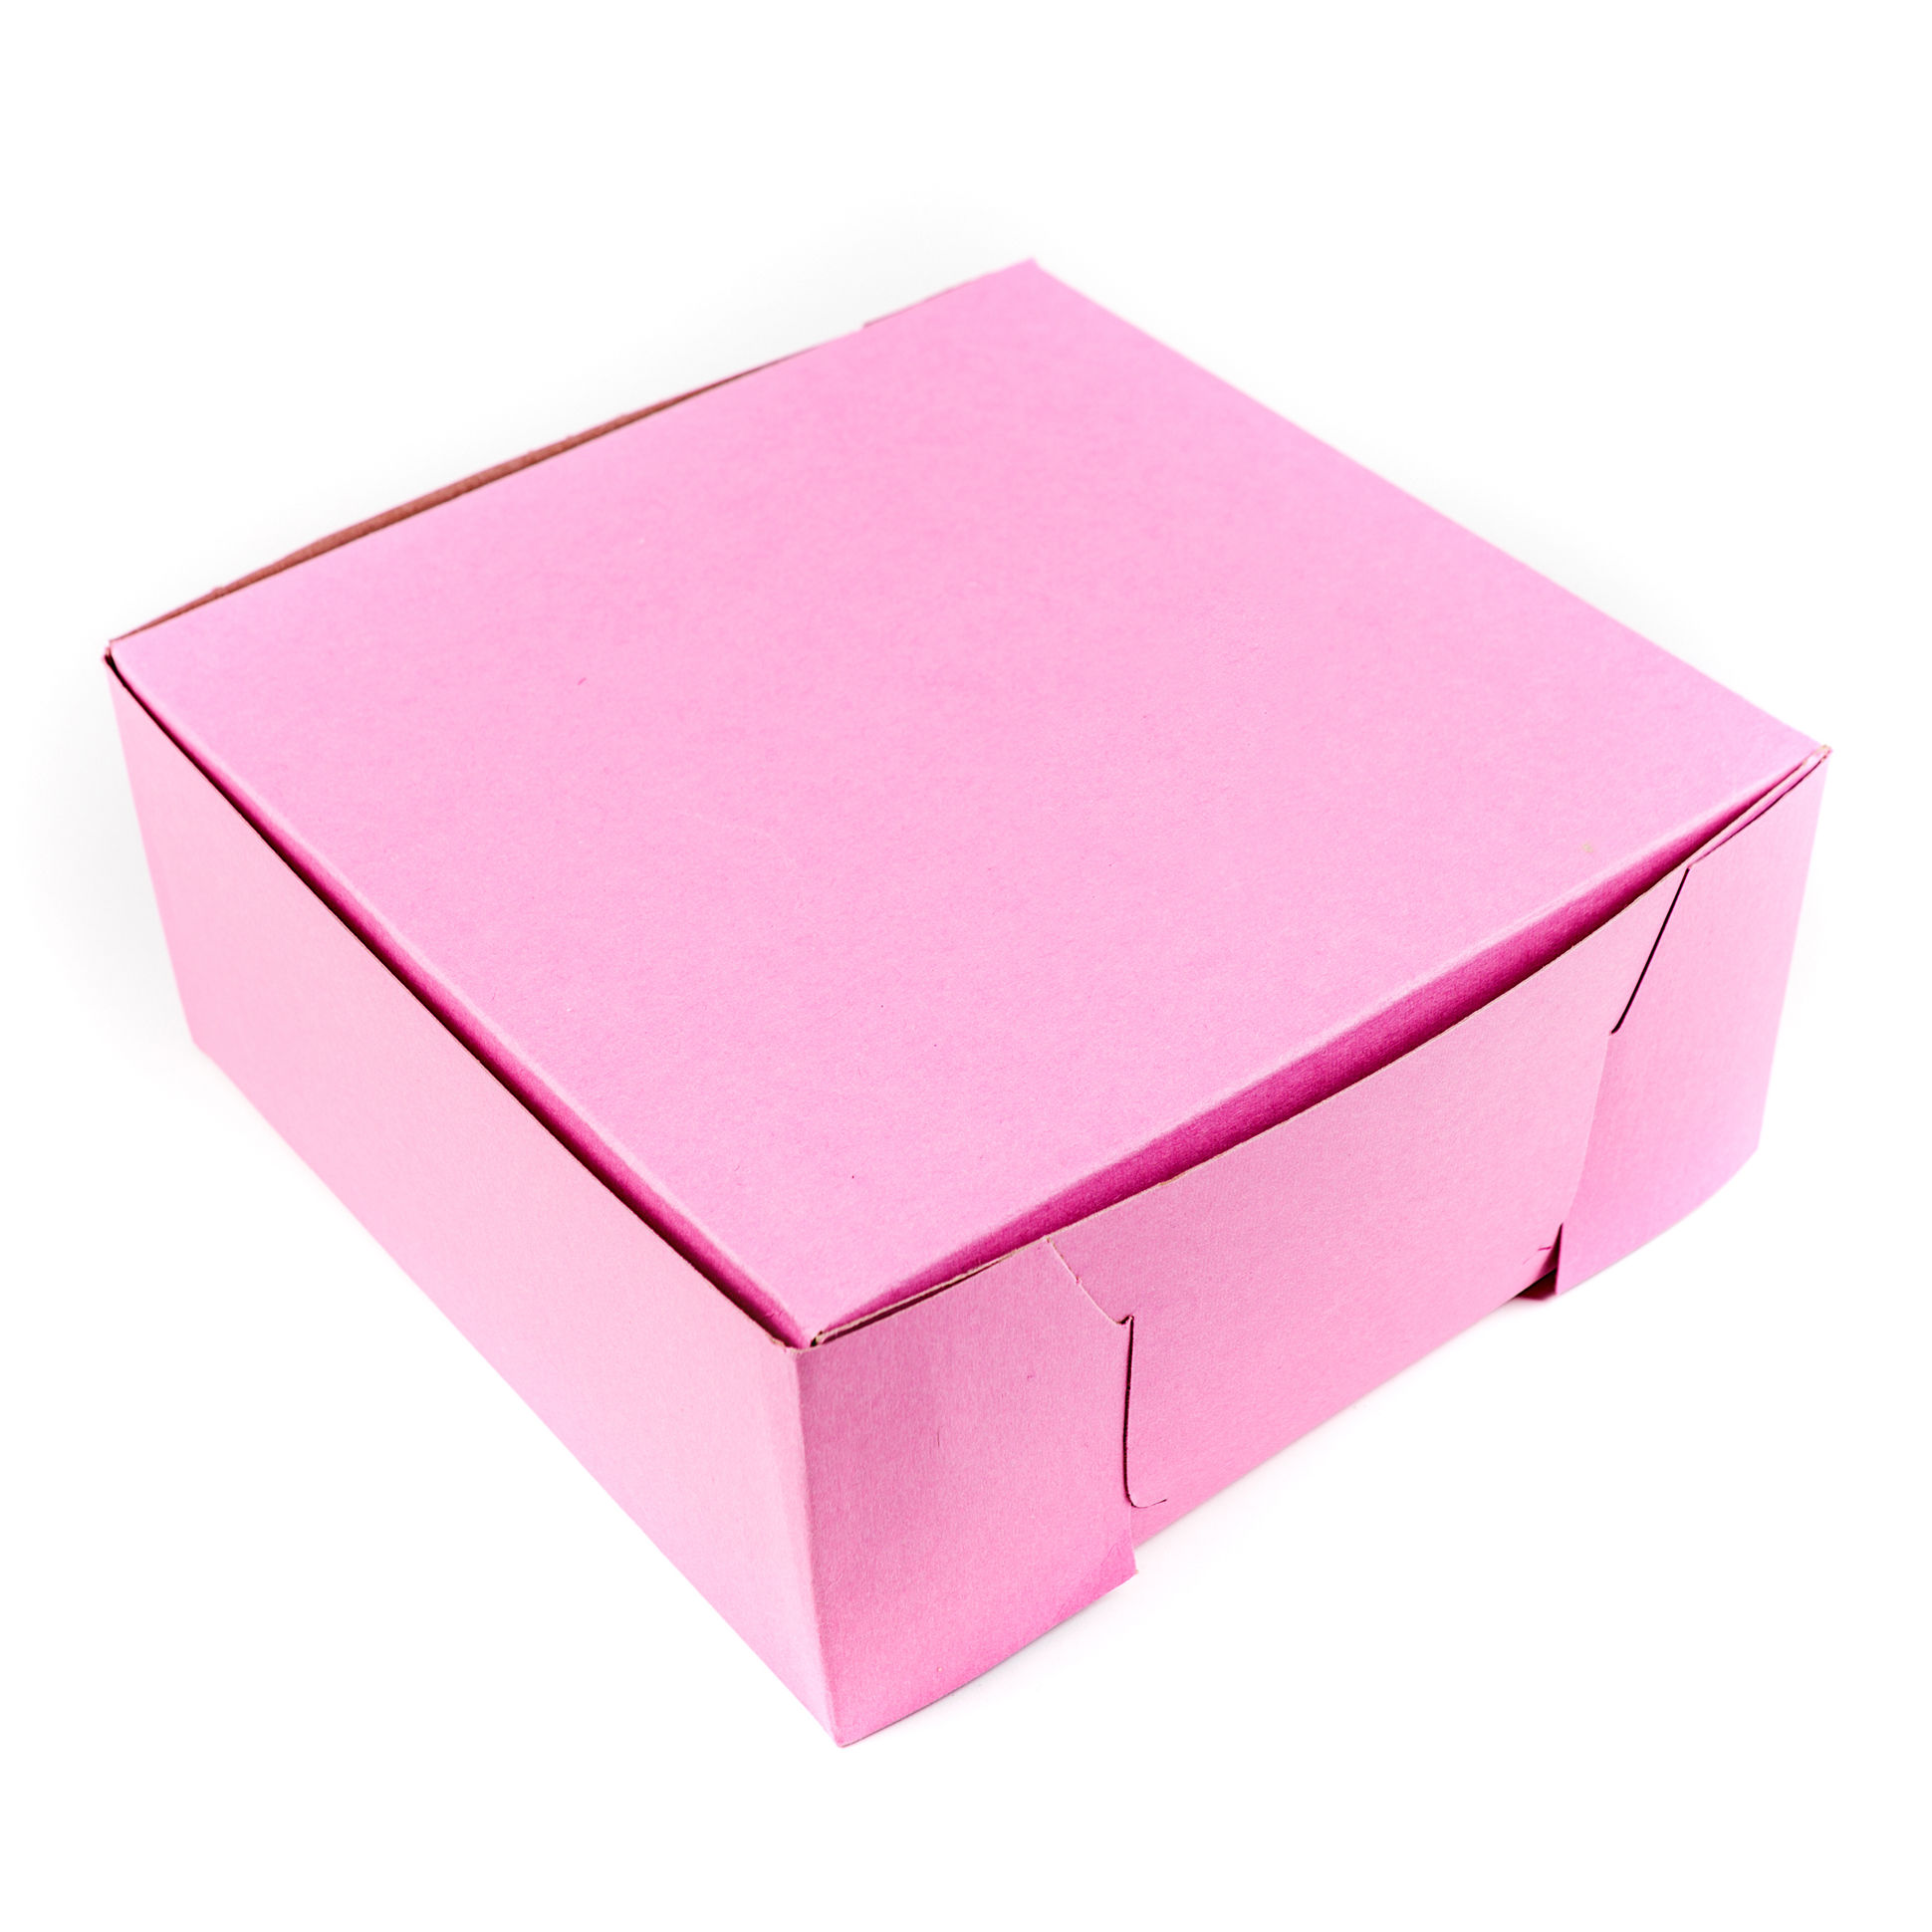 Pink donut box rycecn